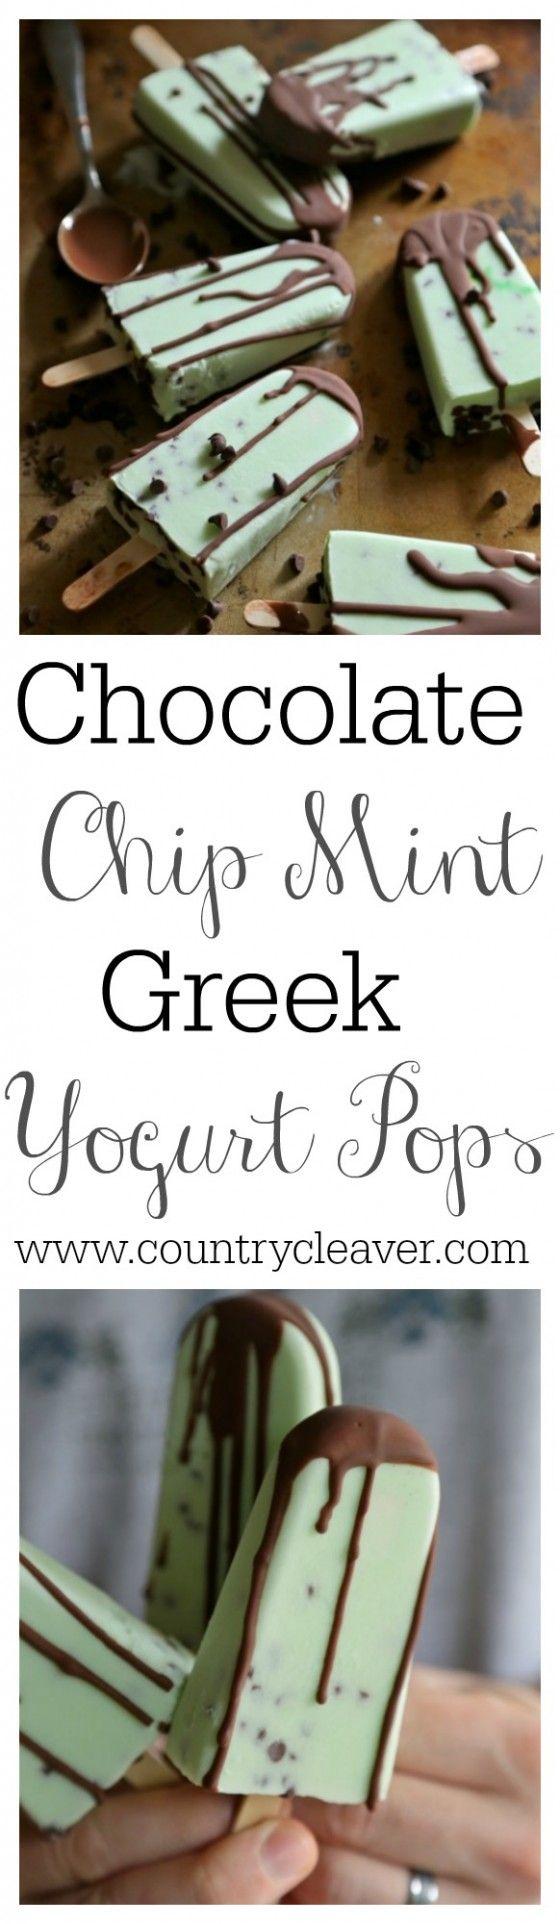 Chocolate Chip Mint Greek Yogurt Pops-- www.countrycleaver.com